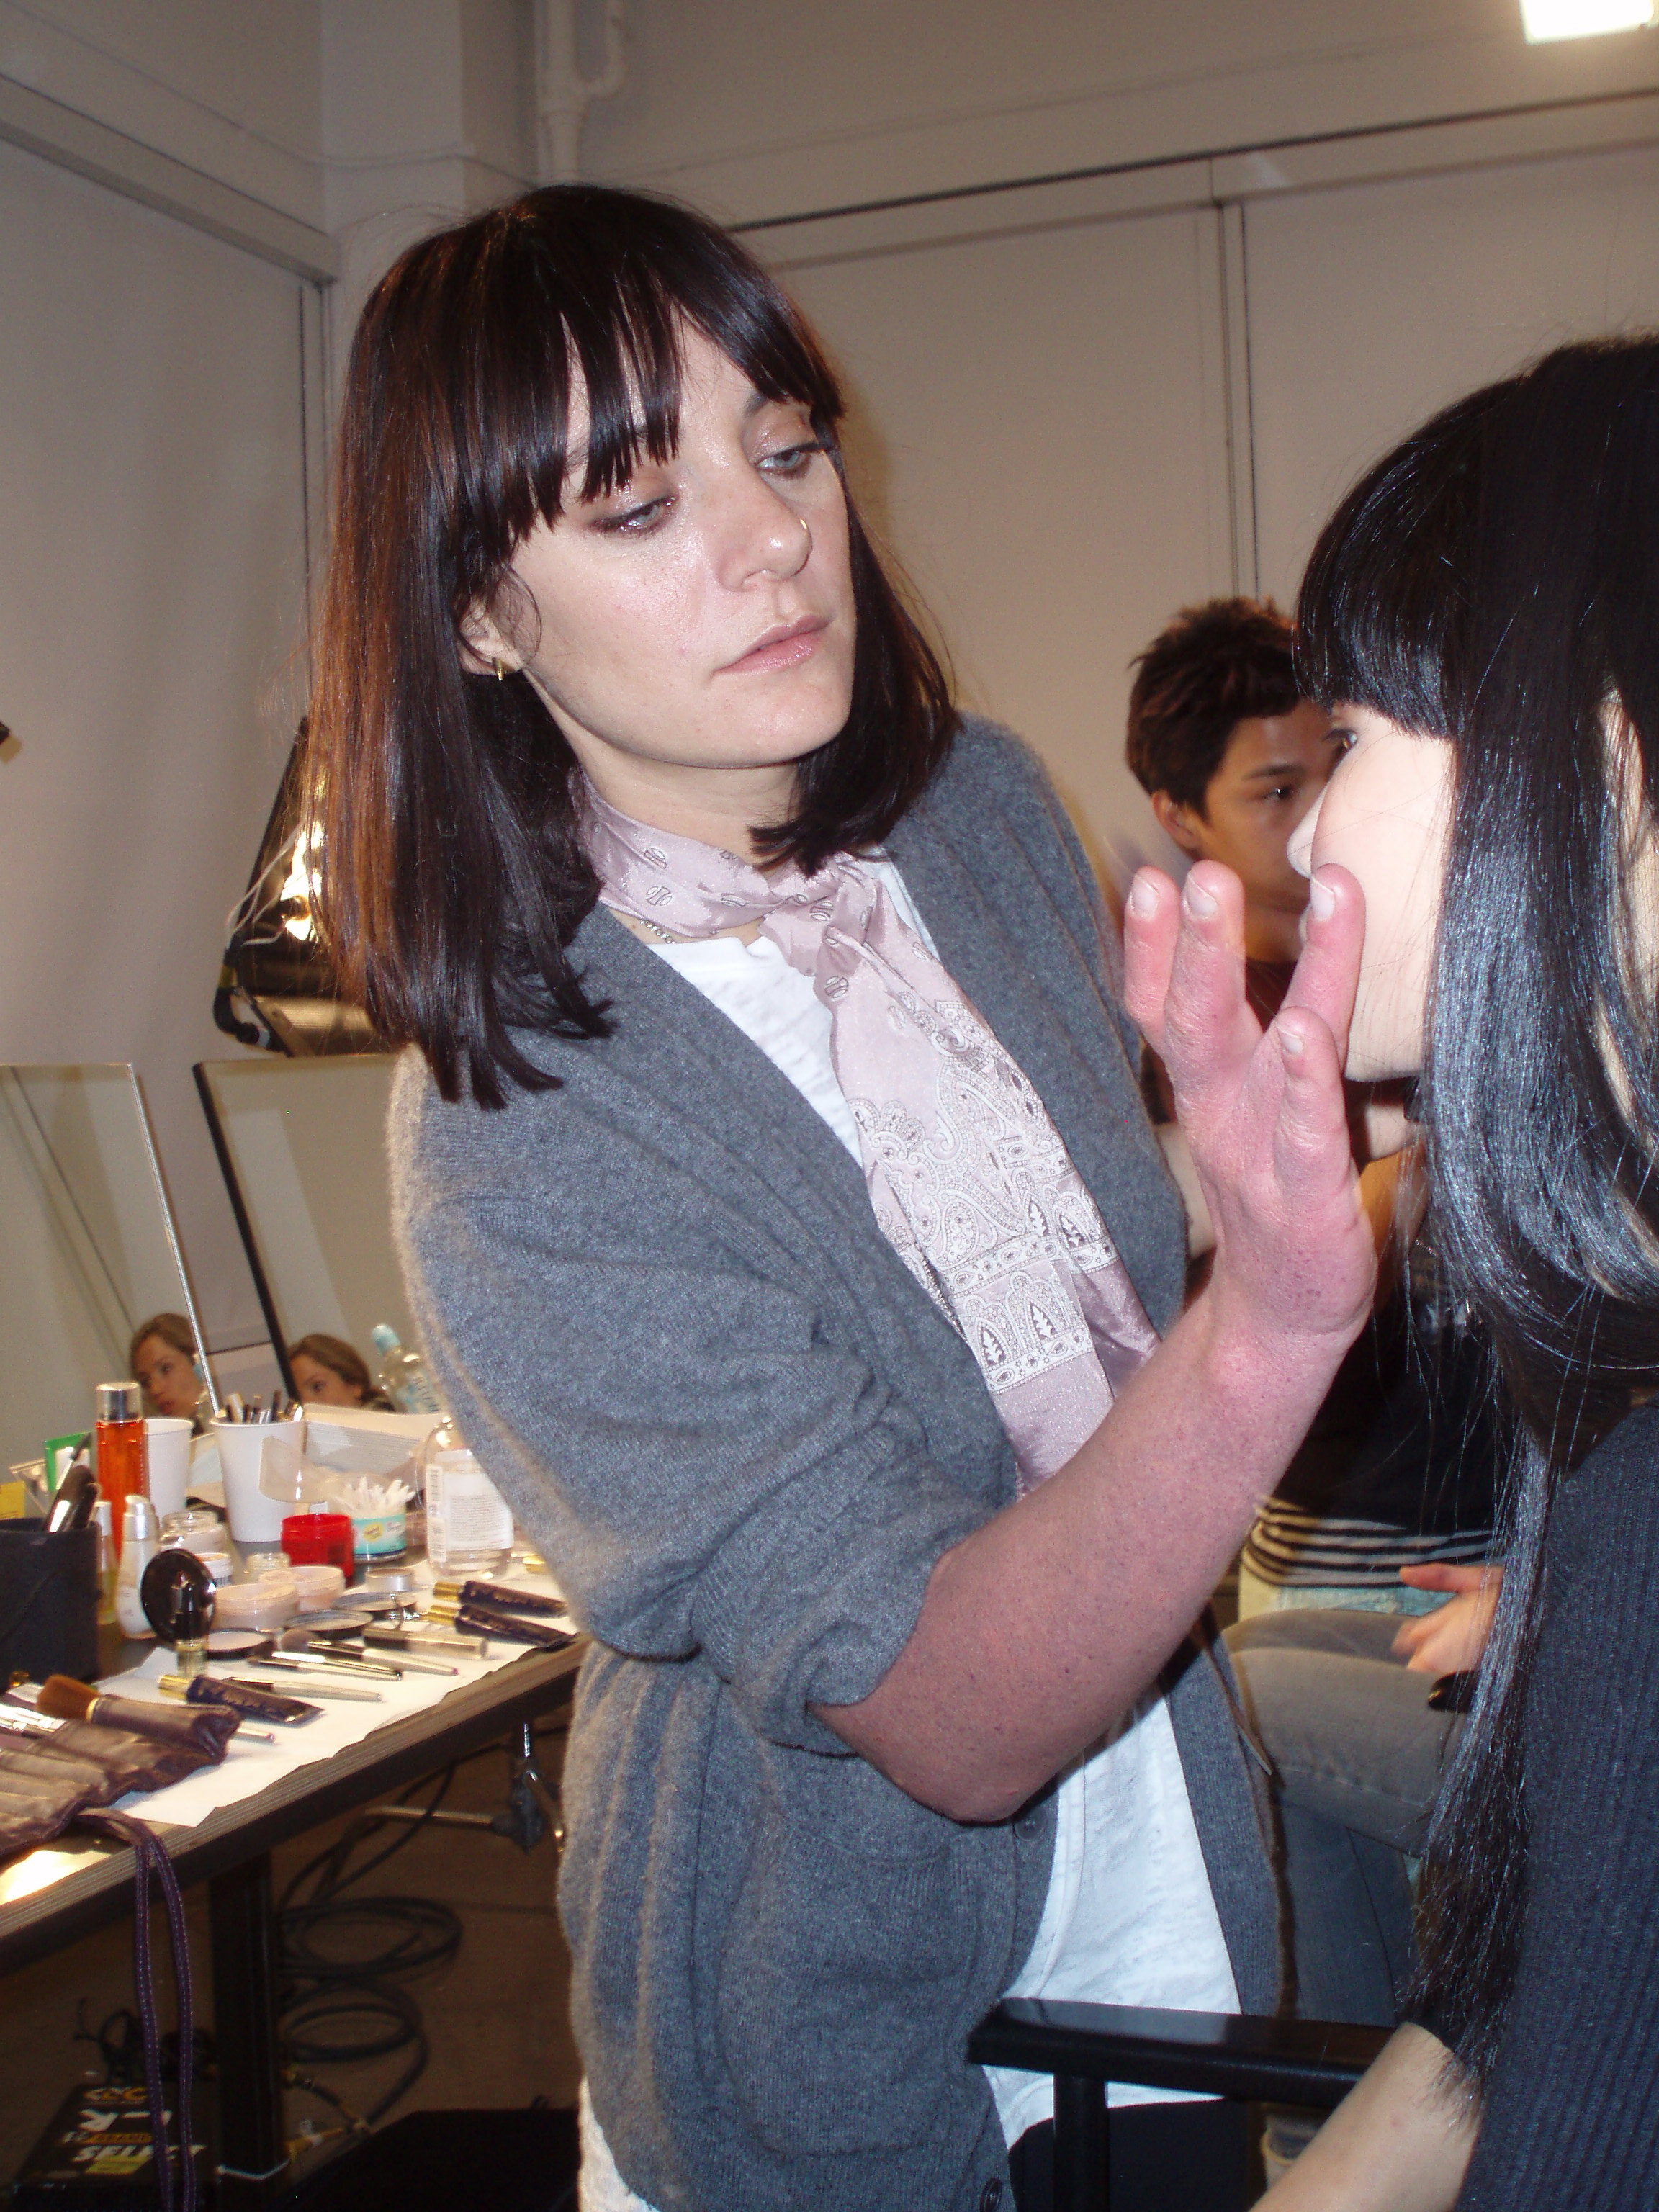 Lucia Pica for M.A.C. Cosmetics